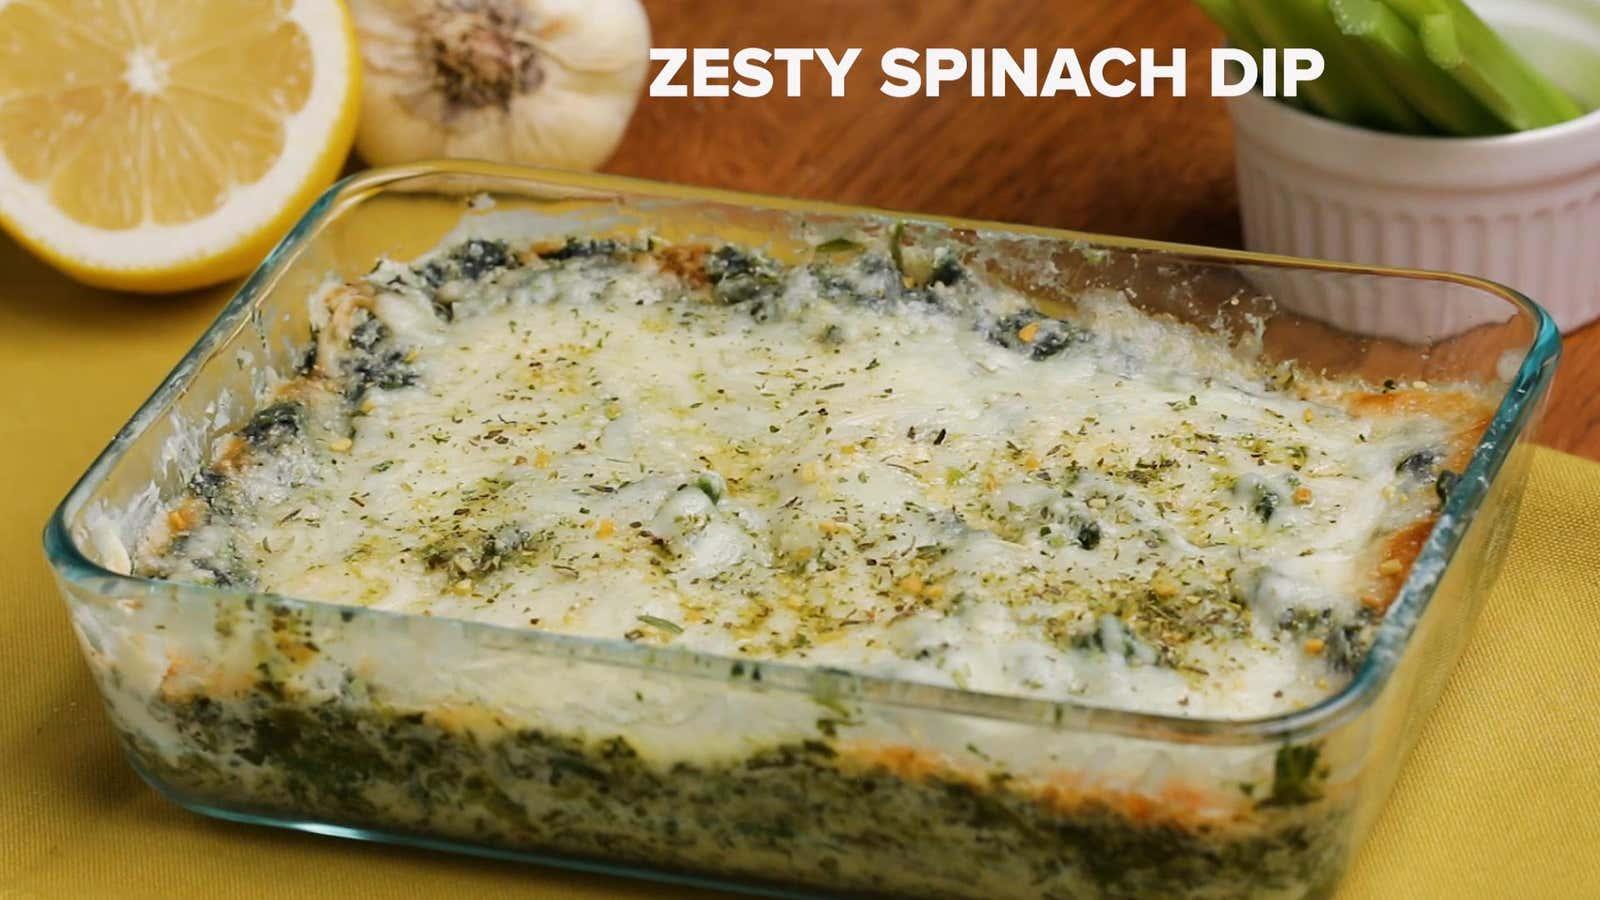 Zesty Spinach Dip Recipe By Tasty